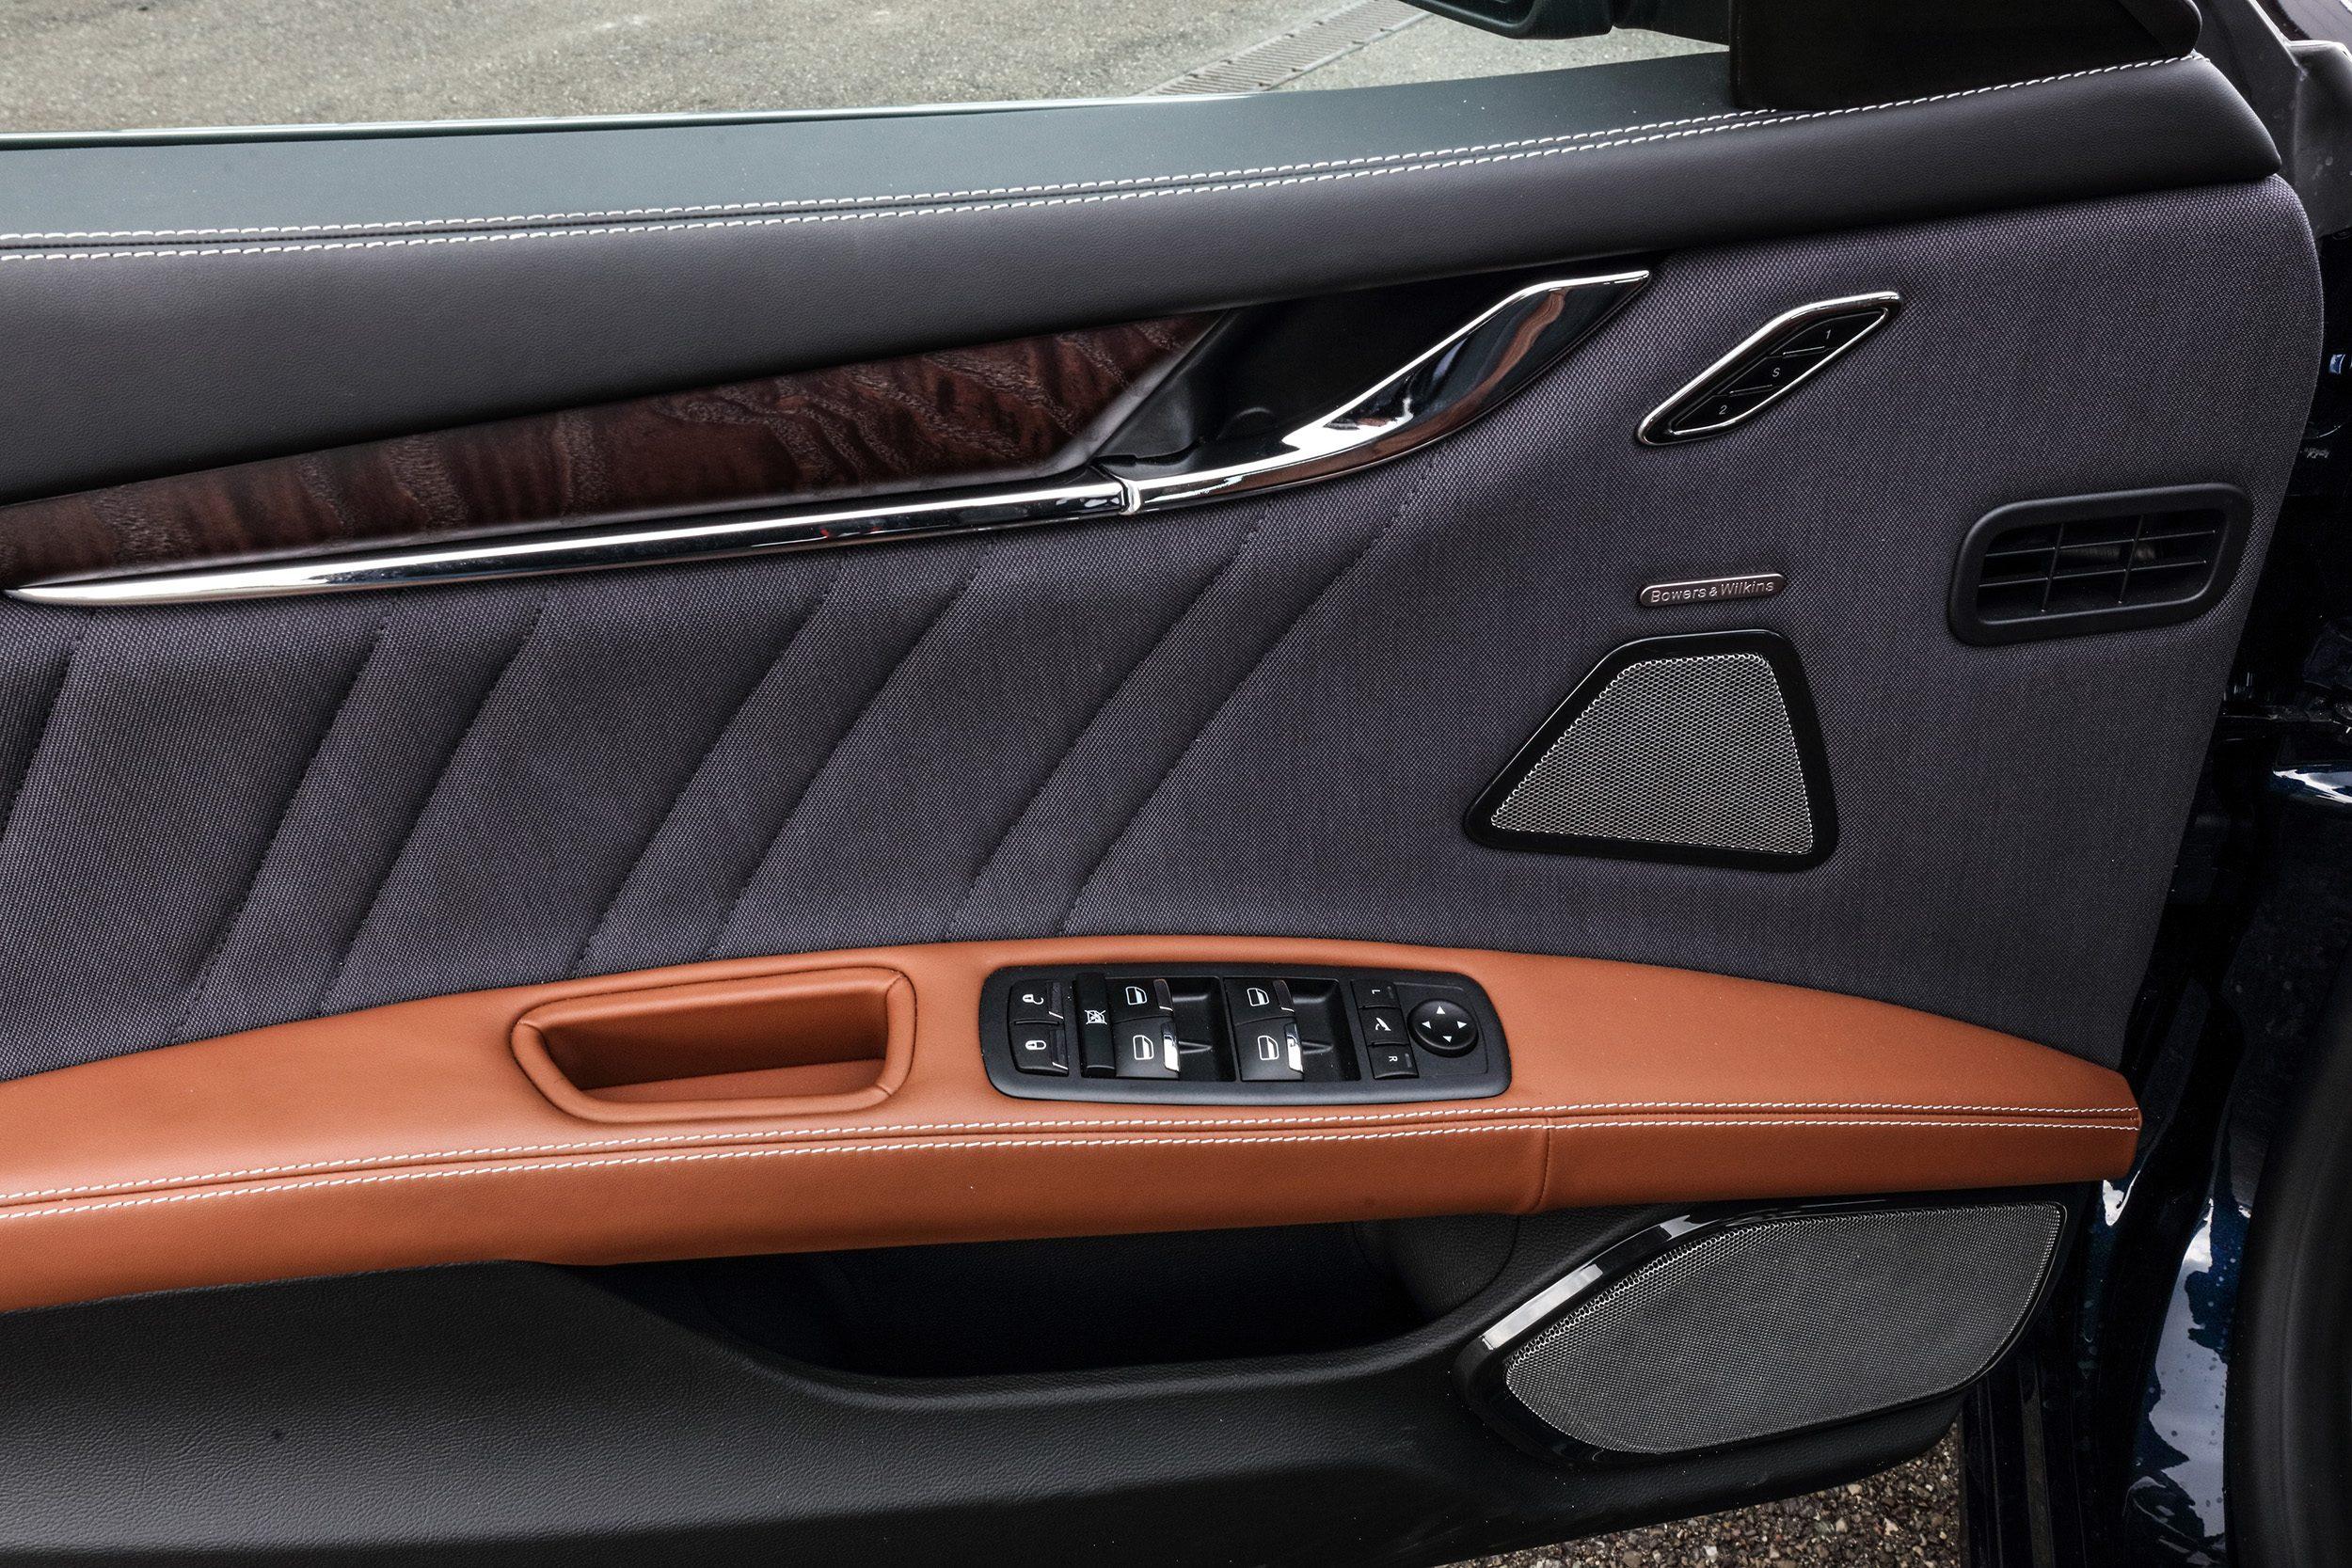 Maserati_Quattroporte_Louwman_Exclusive_Interior2